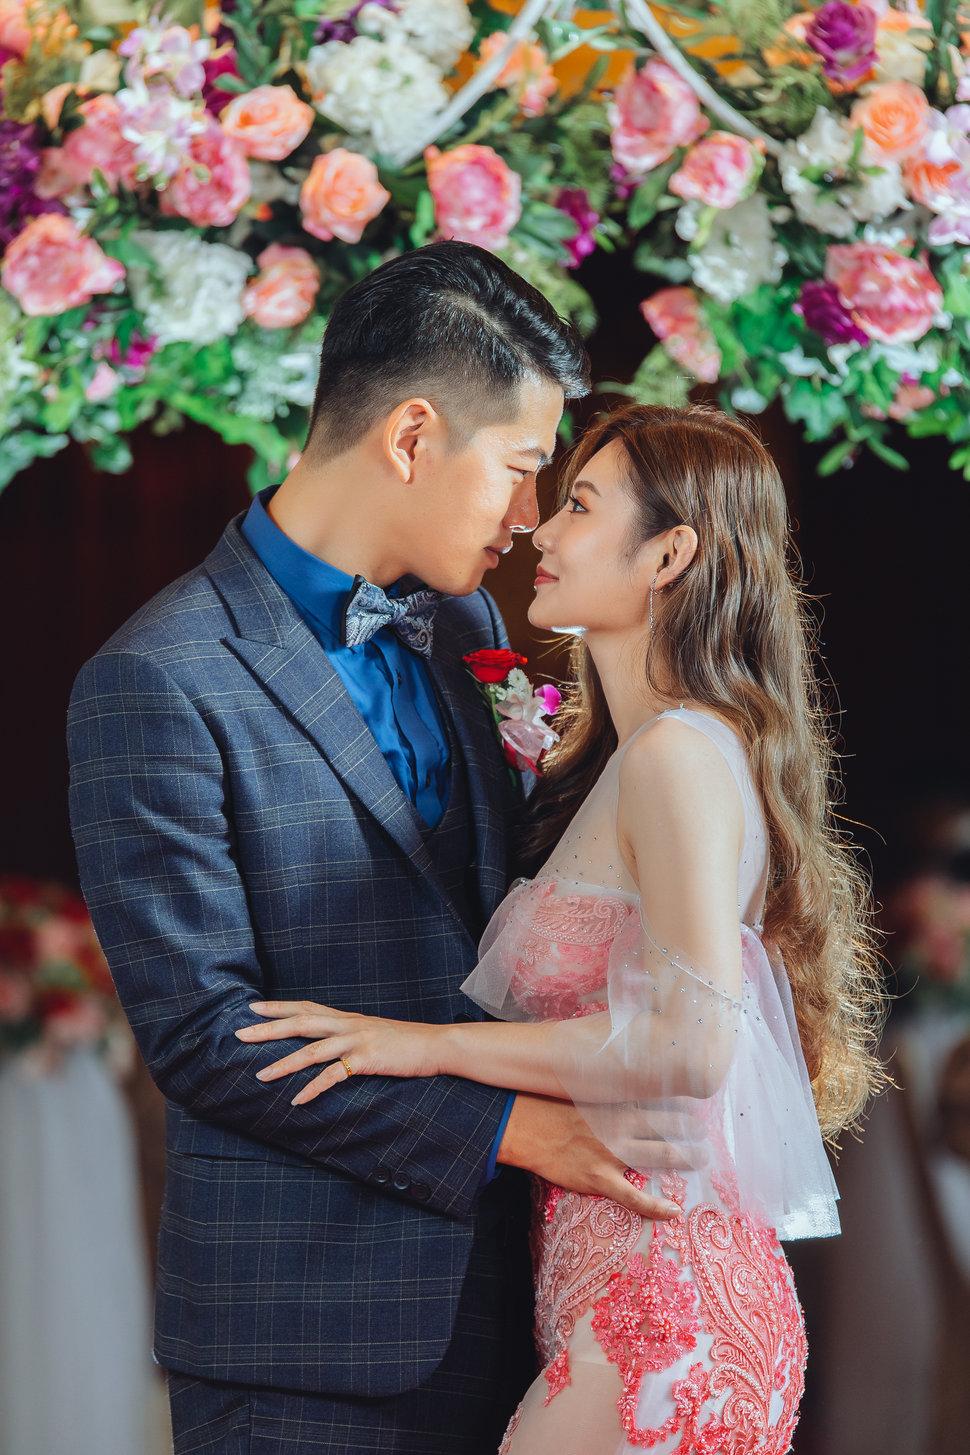 20190914-20190914-QUAN5208-編輯 - QUAN  婚禮紀錄 / 影像工作室《結婚吧》